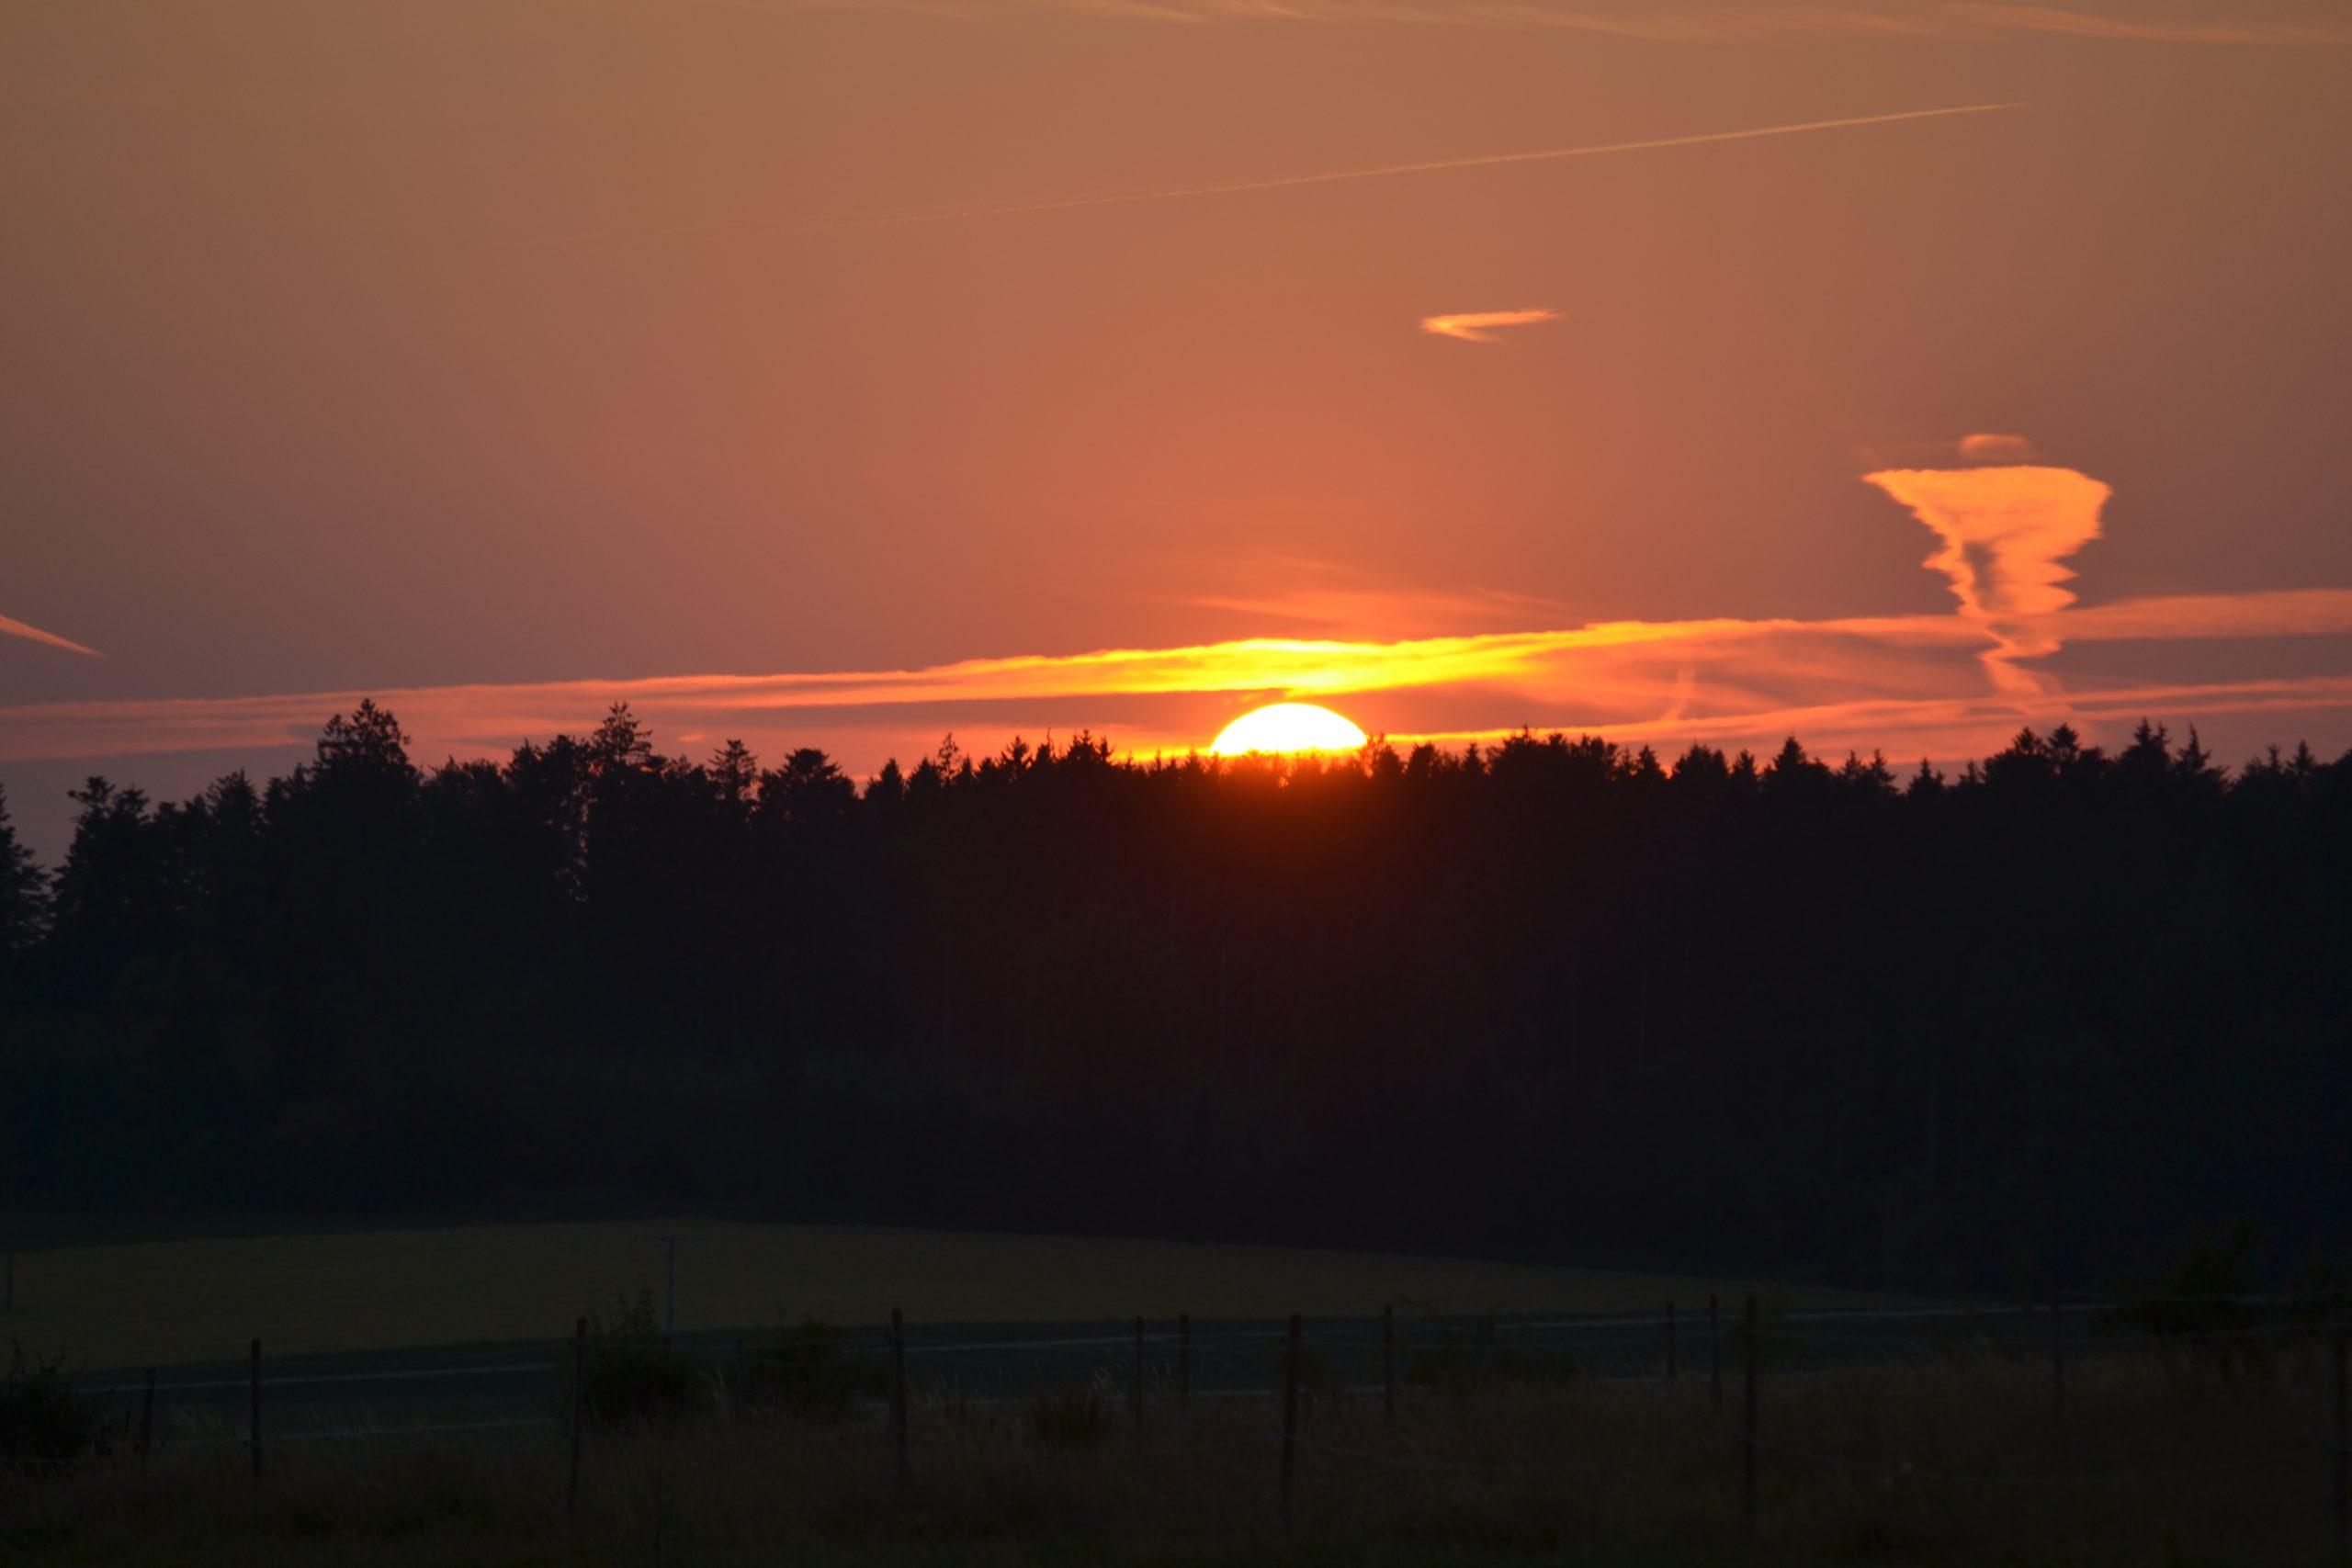 Seehöfle's Sonnenuntergang